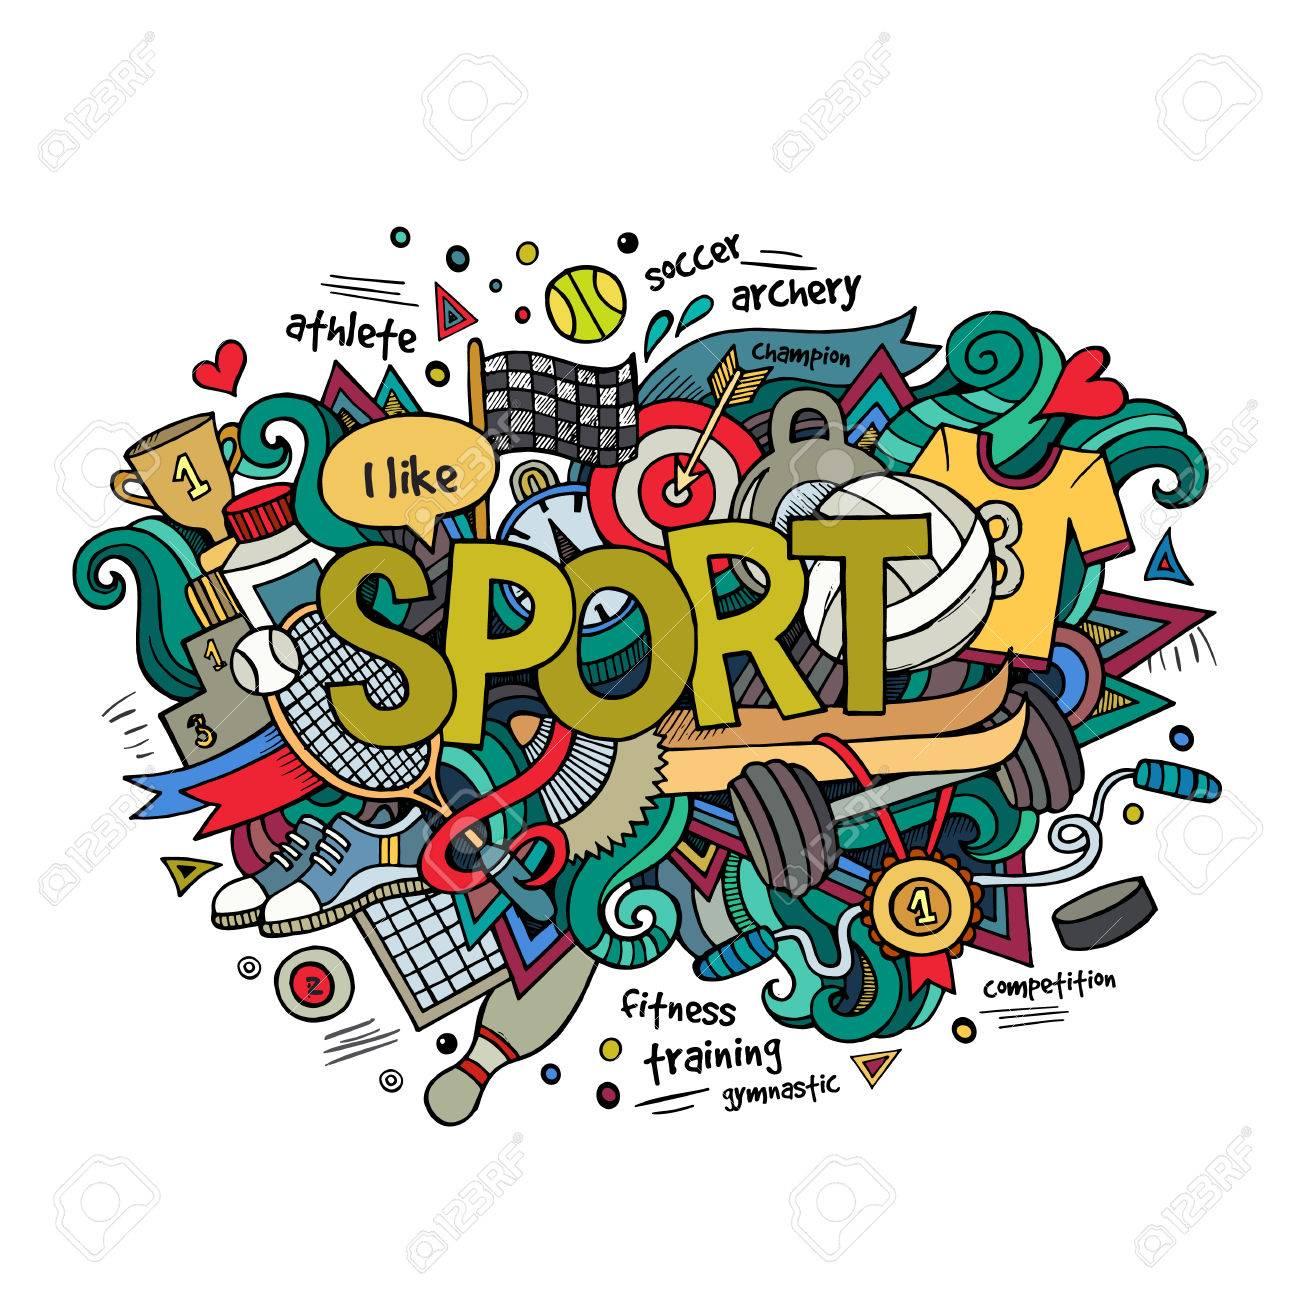 Sport hand lettering and doodles elements background. Vector illustration - 41699359